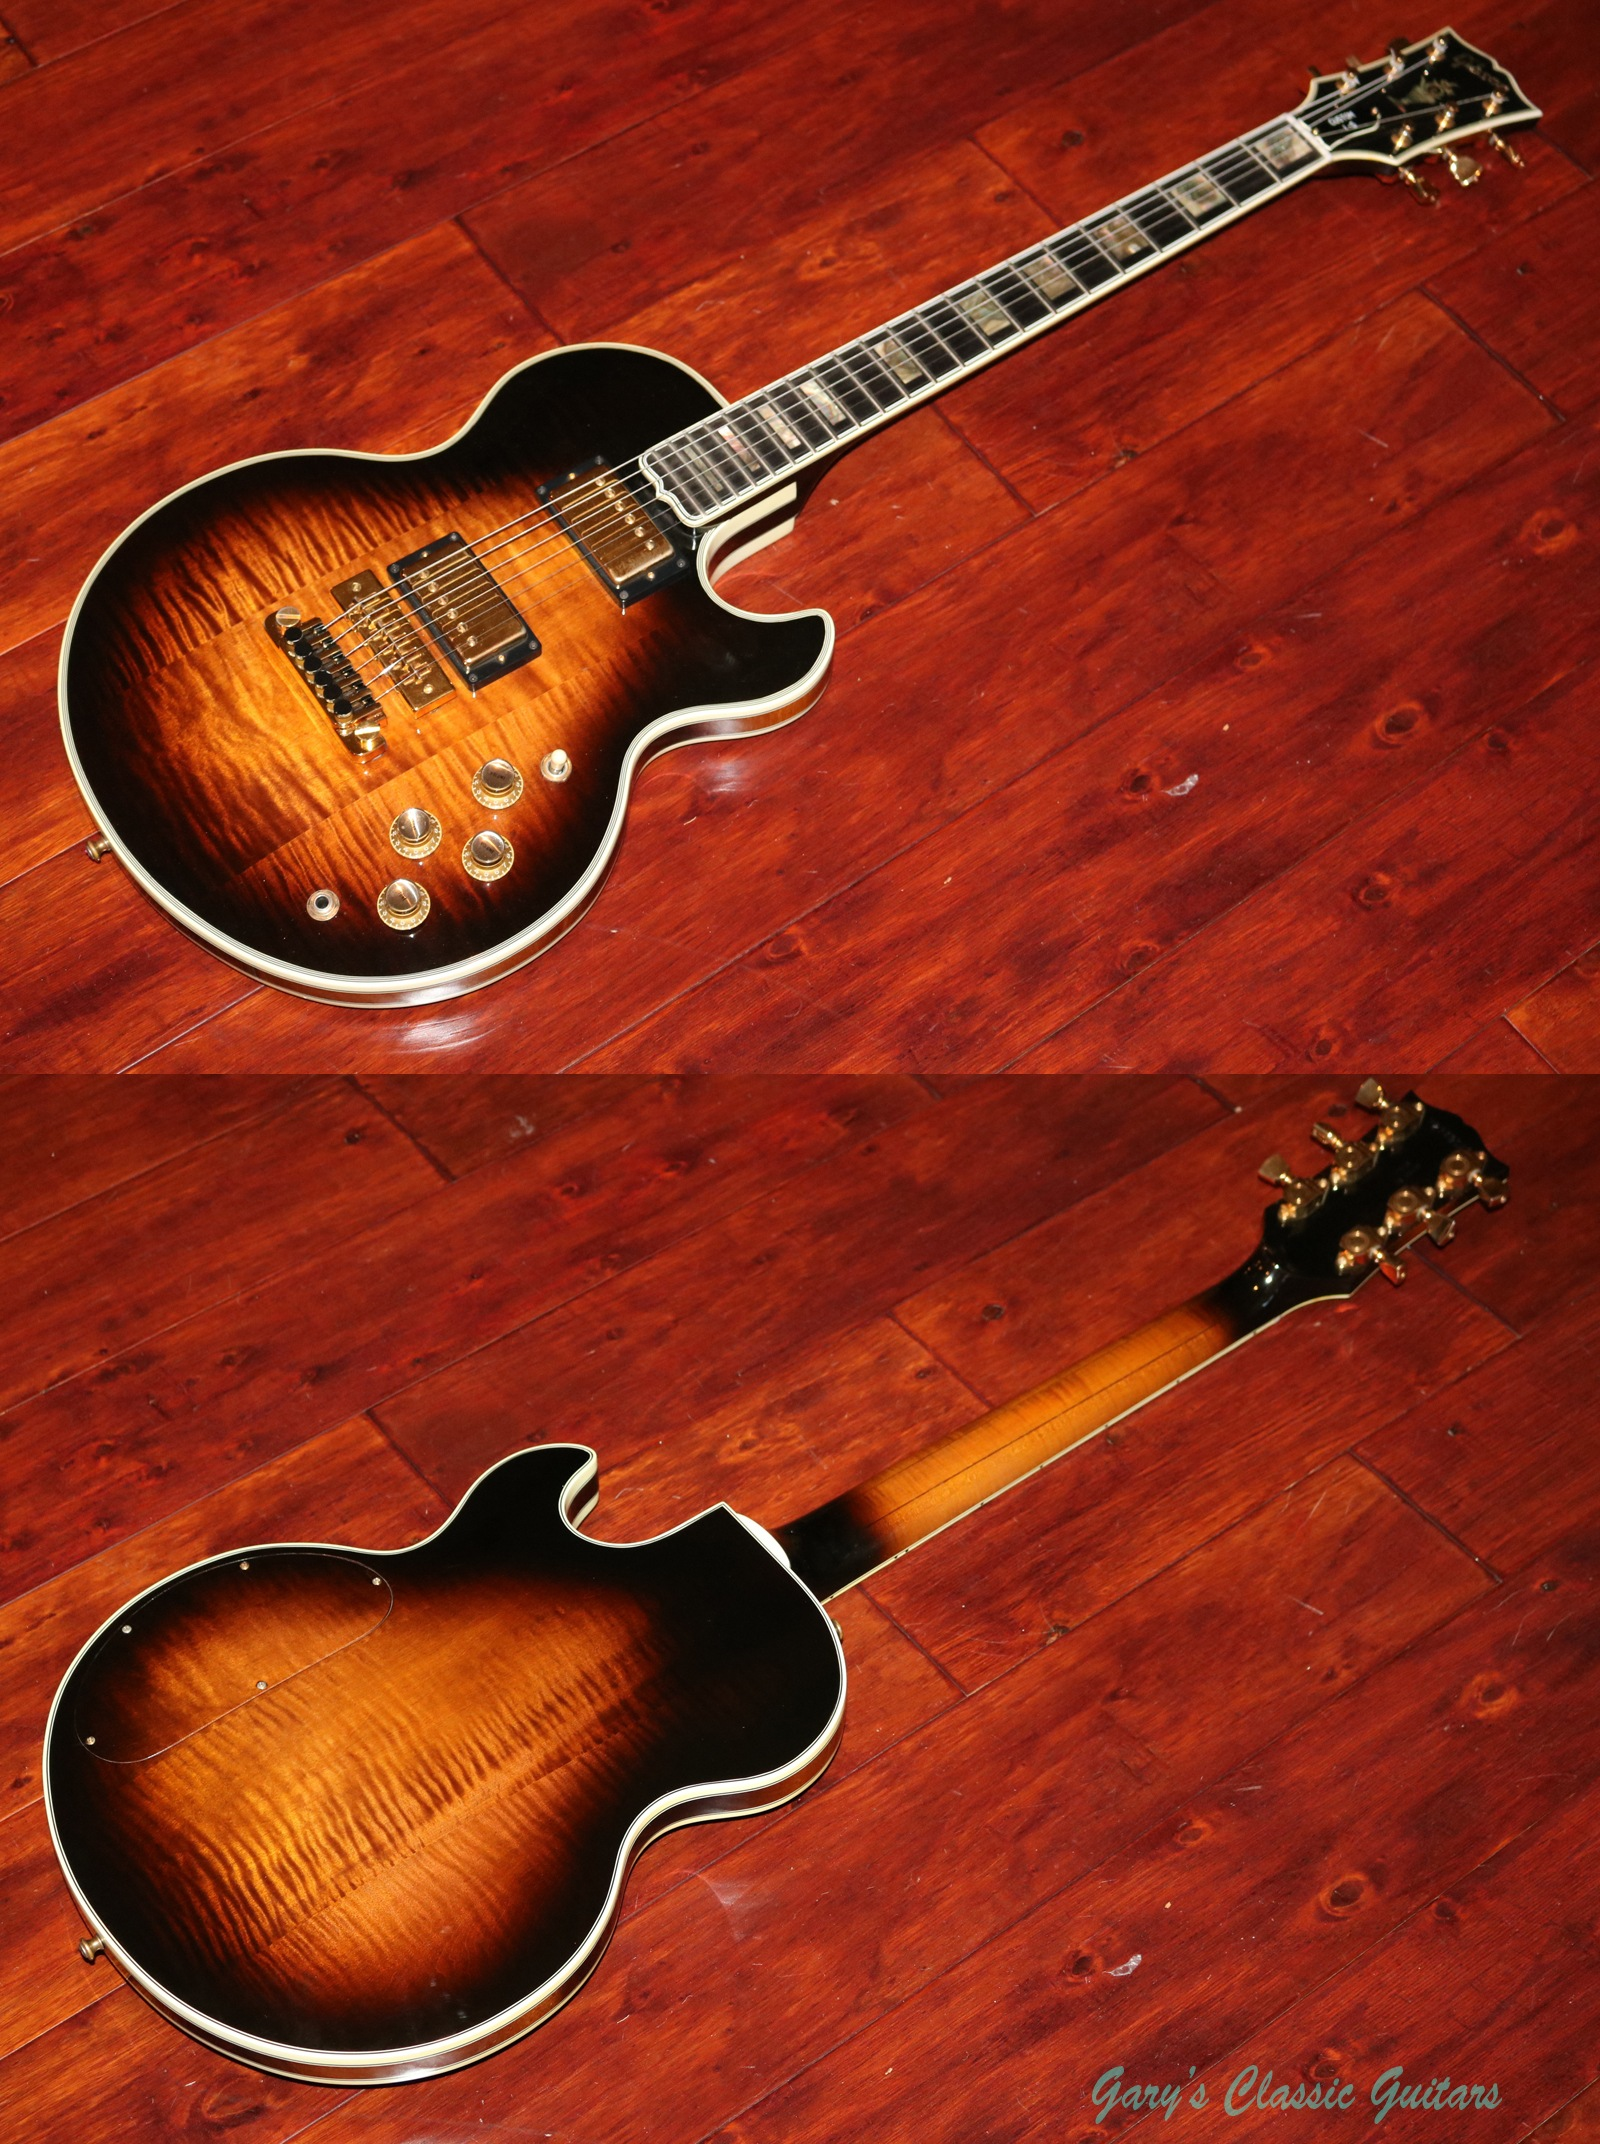 1979 Gibson L5-S   Garys Classic Guitars & Vintage Guitars LLC